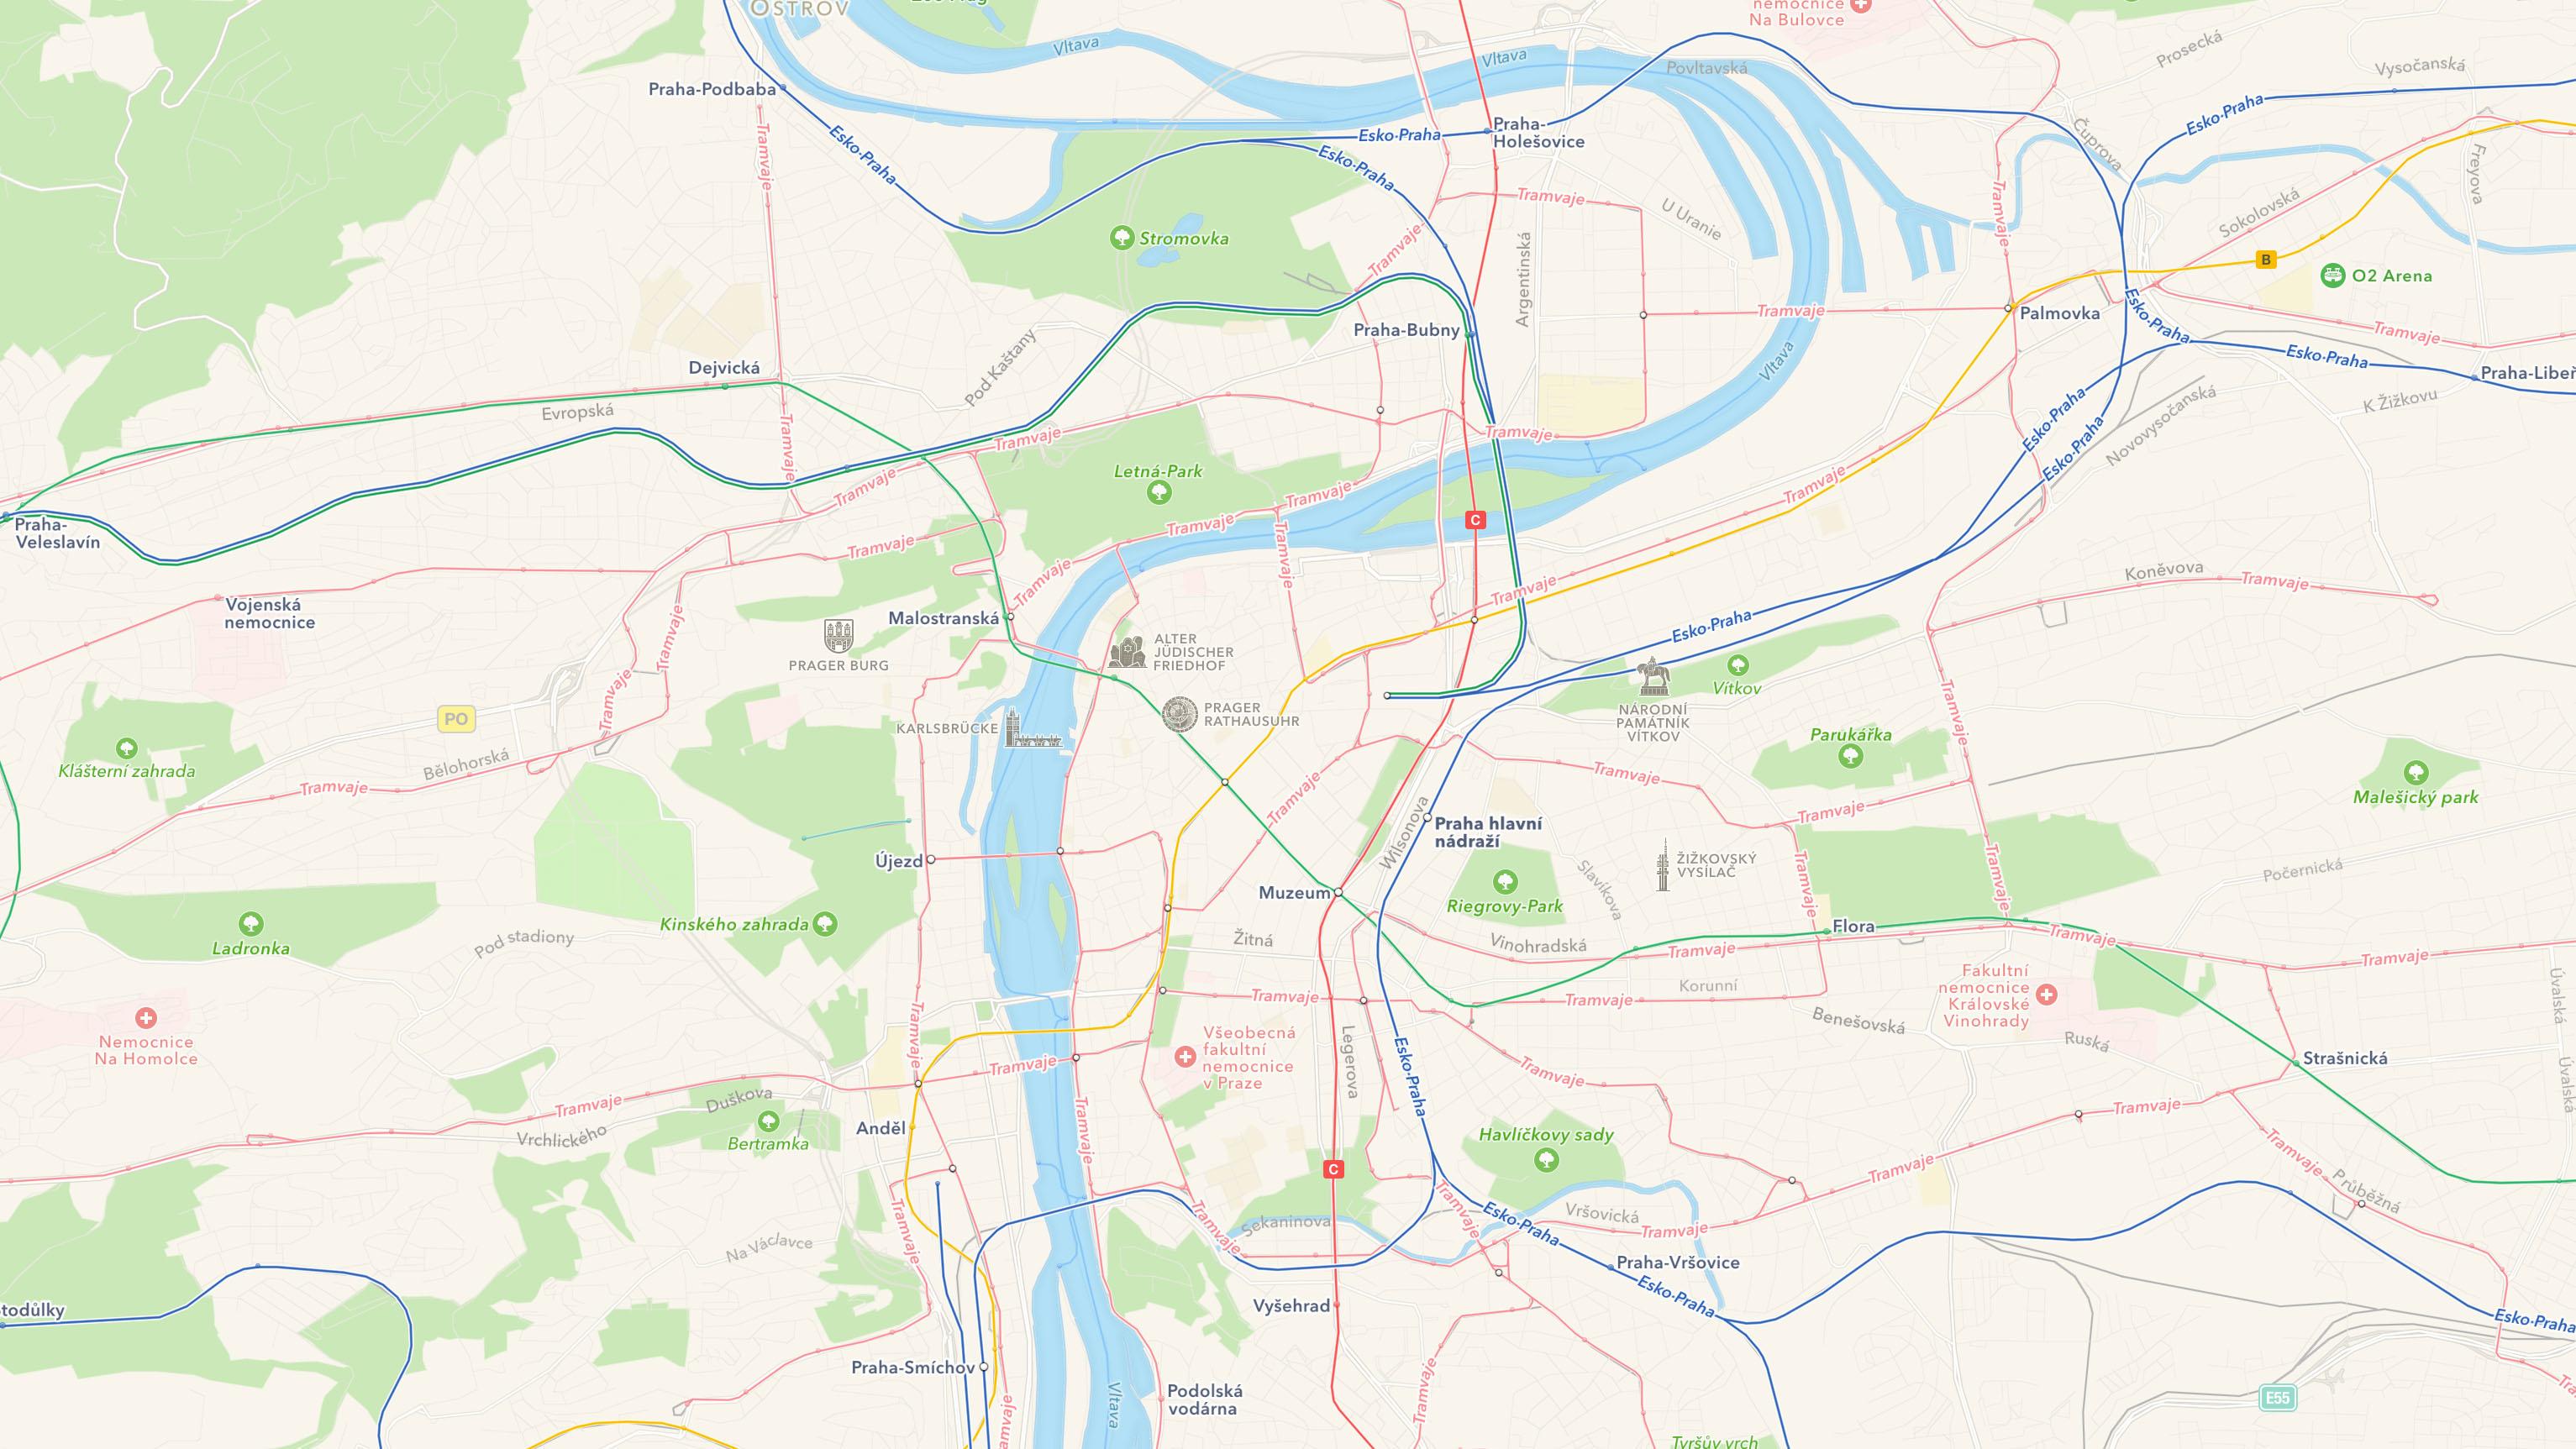 Prag Karte Europa.Apple Karten Neue öpnv Daten In Europa News Mactechnews De